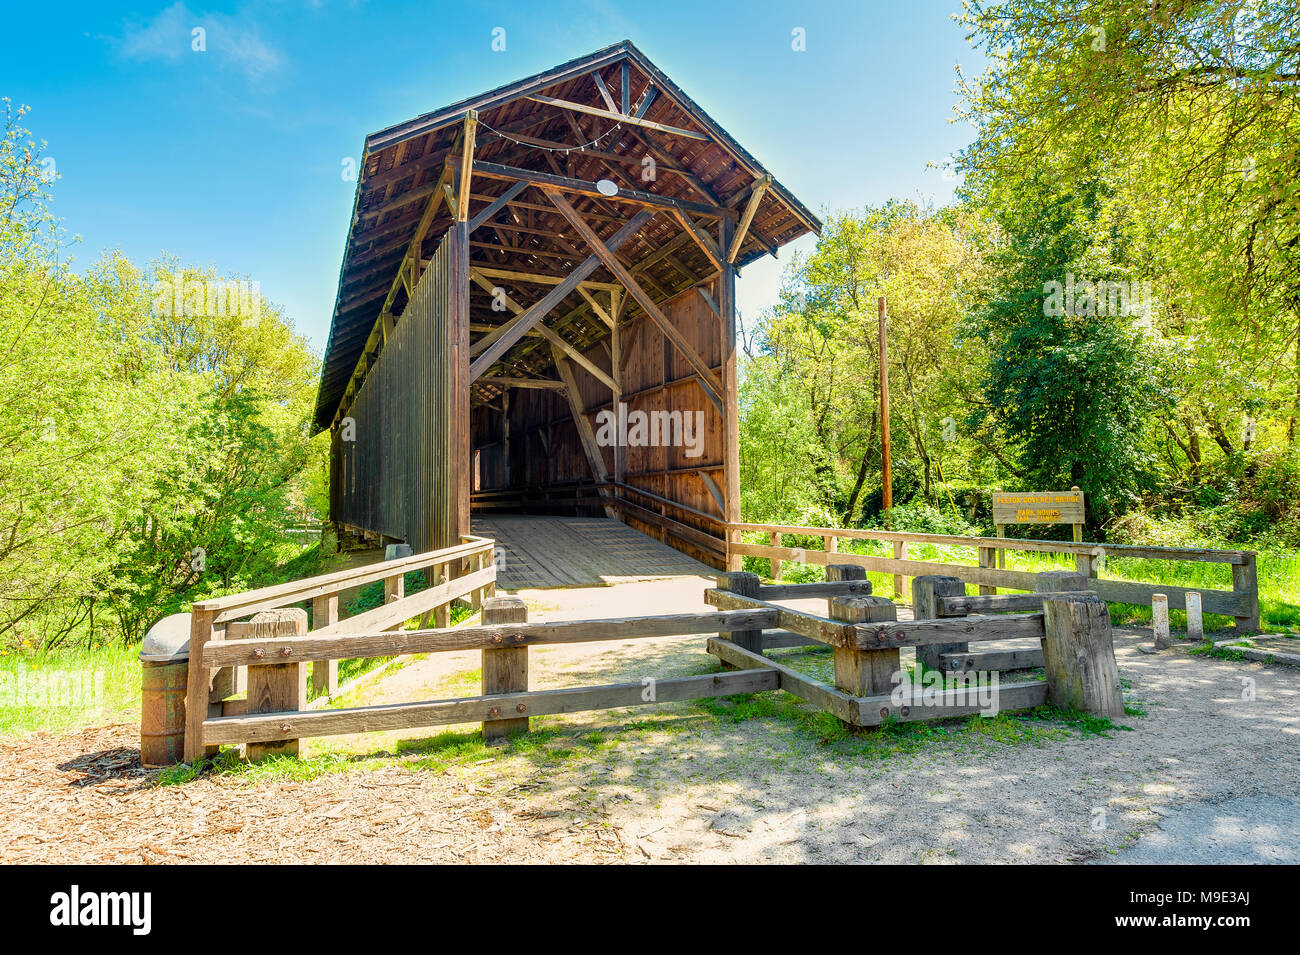 Covered Bridge in Felton California - Stock Image